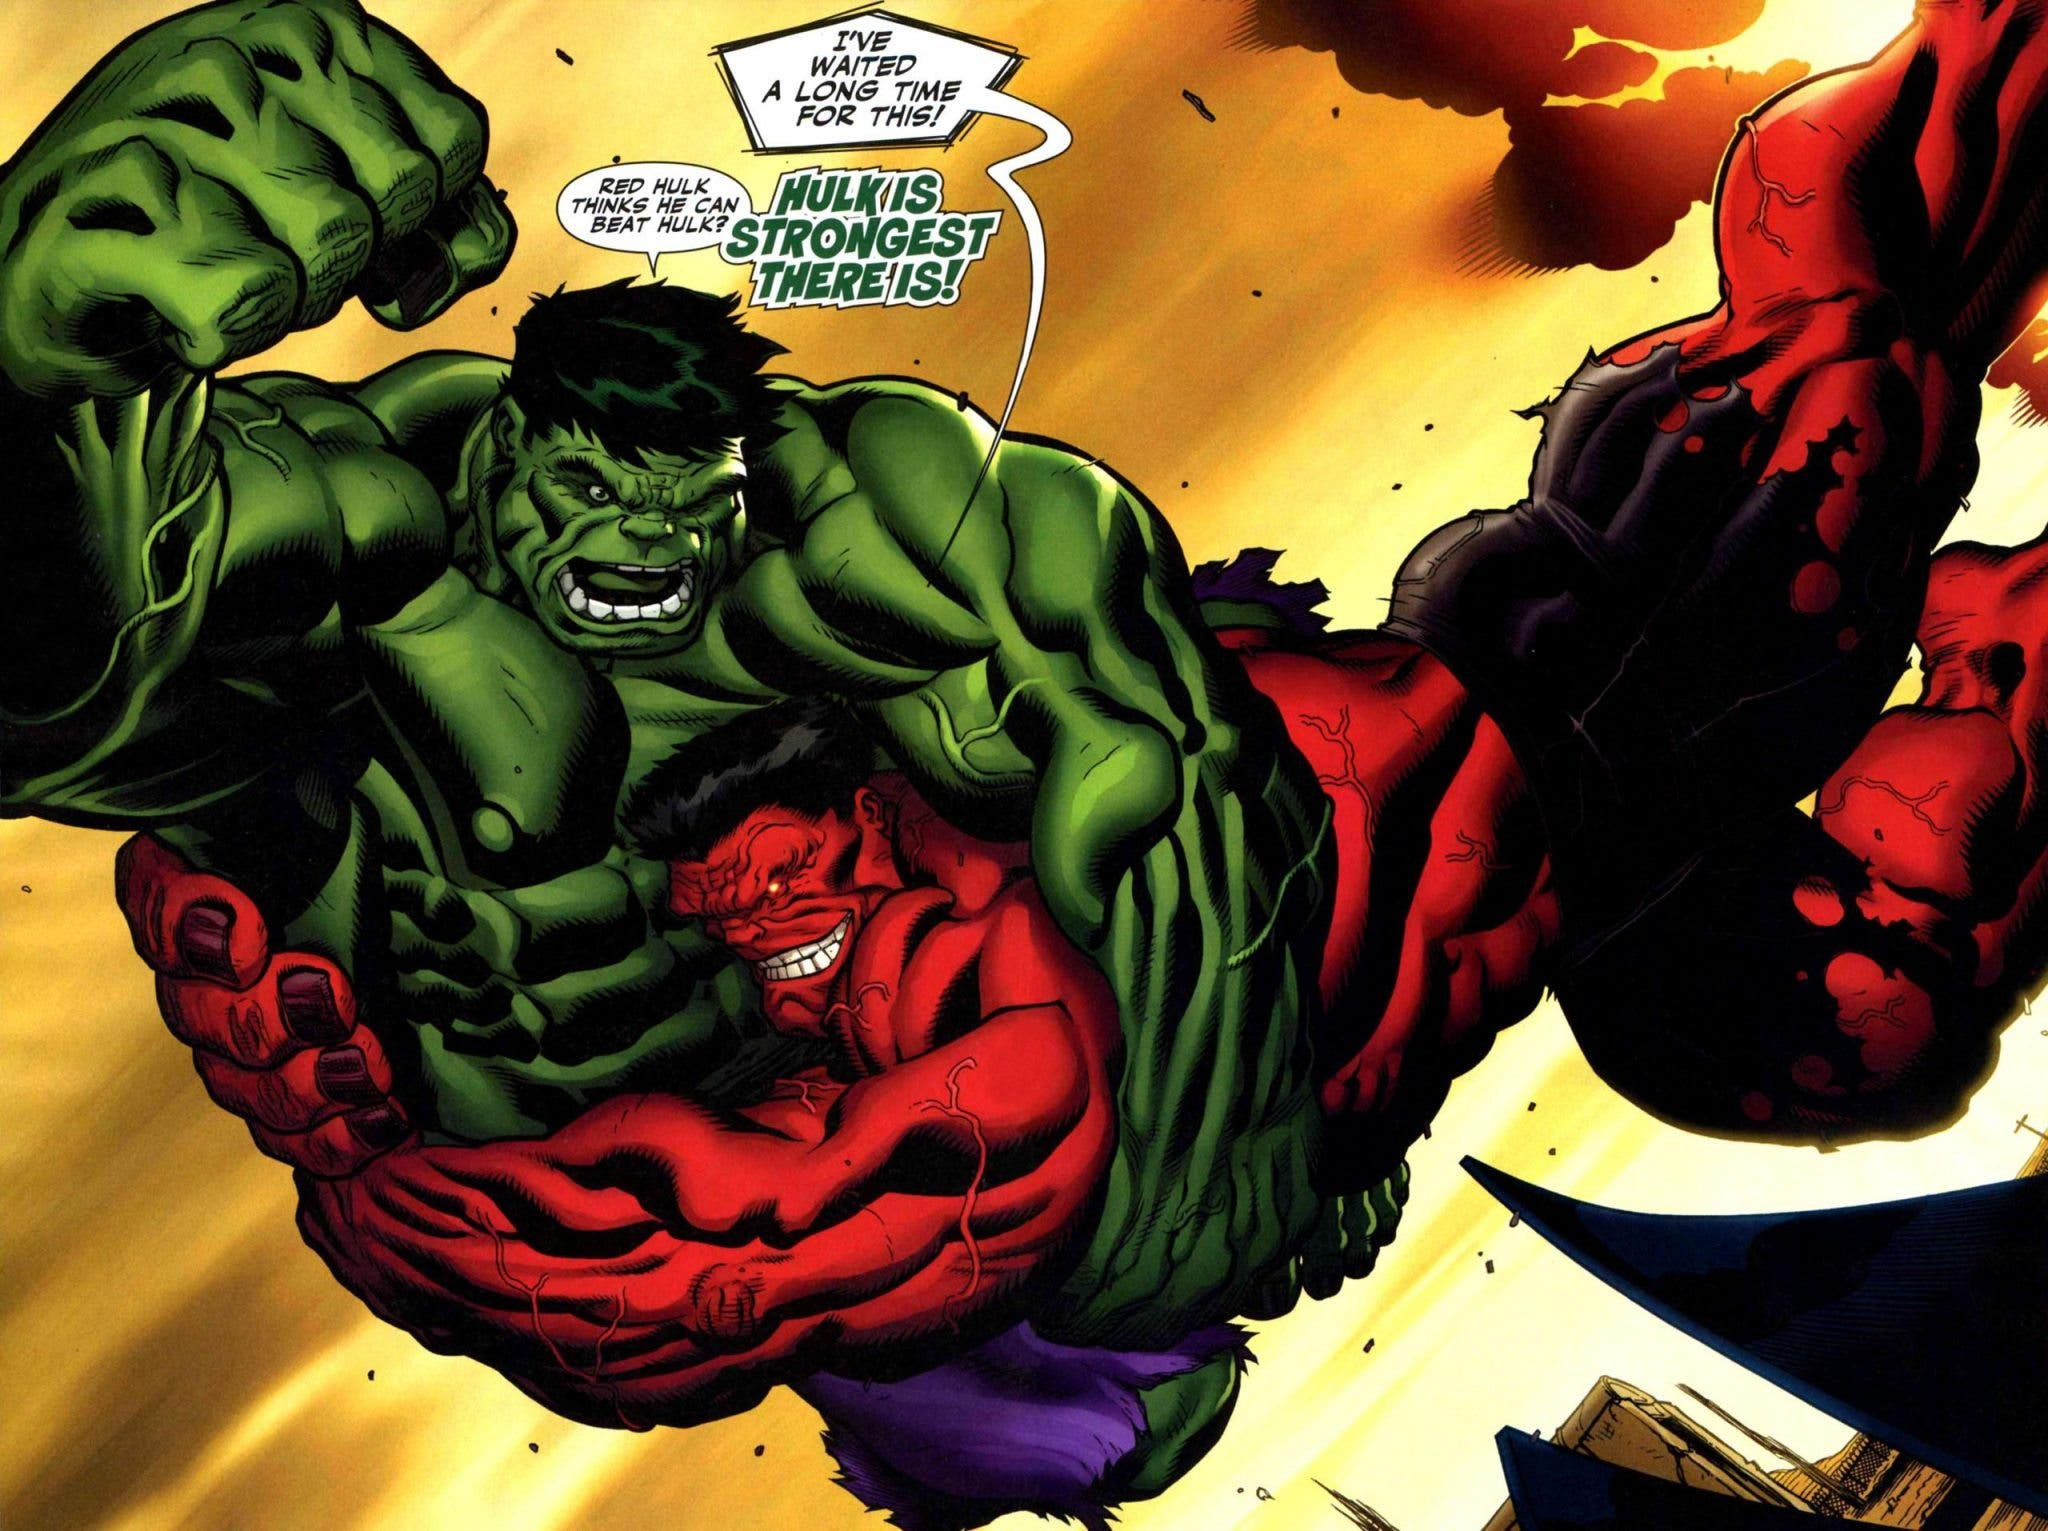 ¿Veremos a Red Hulk contra Hulk en Capitán América: Civil War?